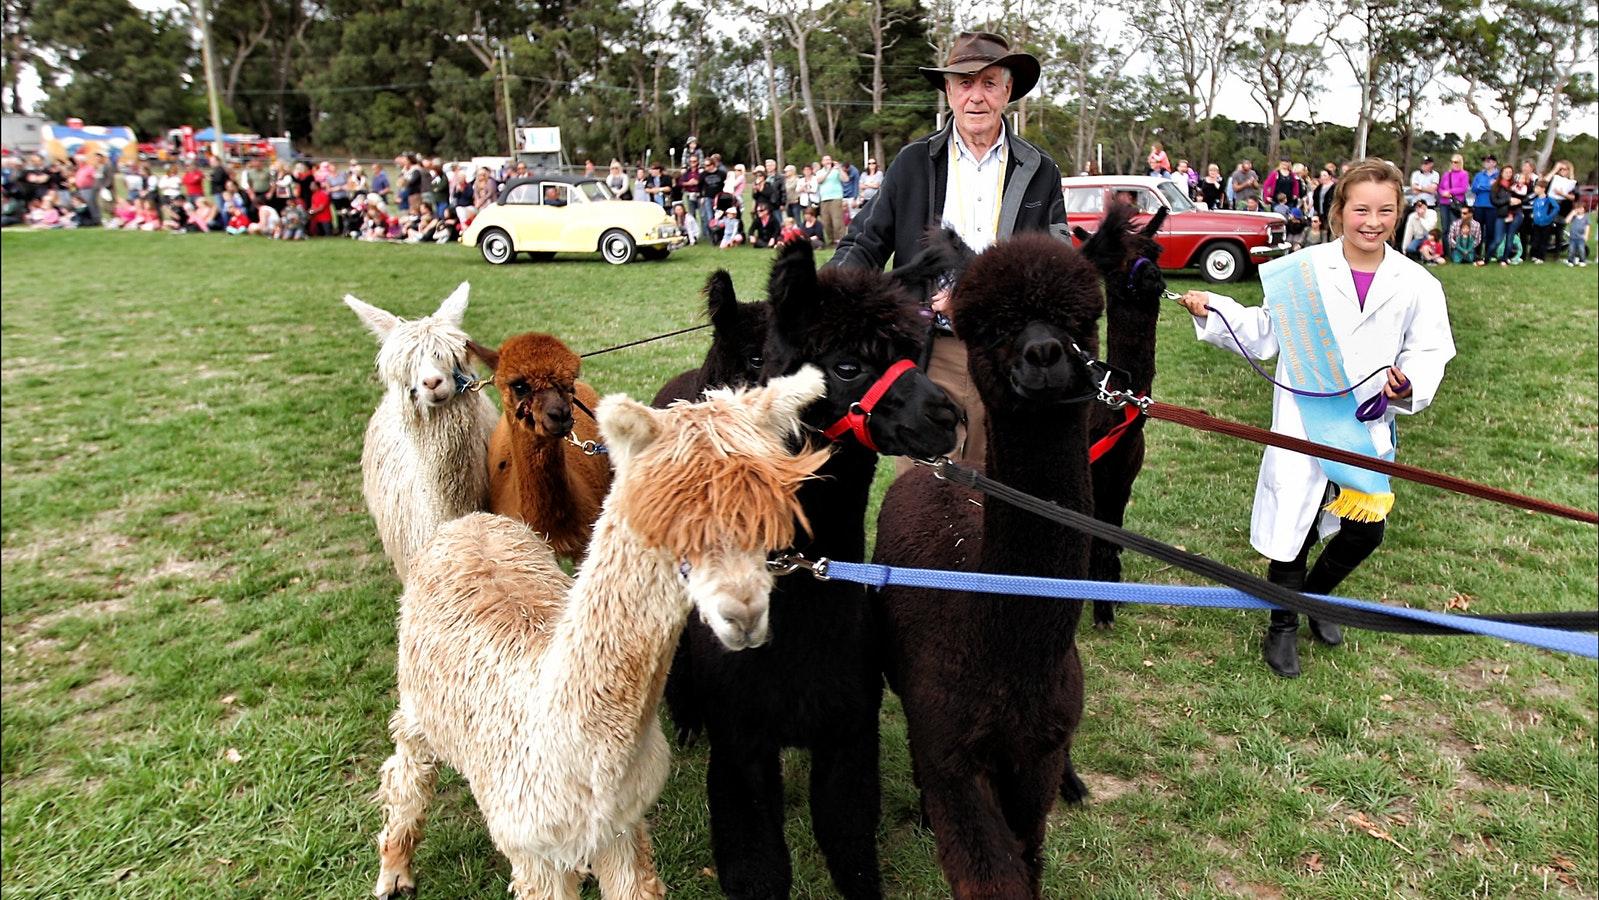 Alpacas steal the show